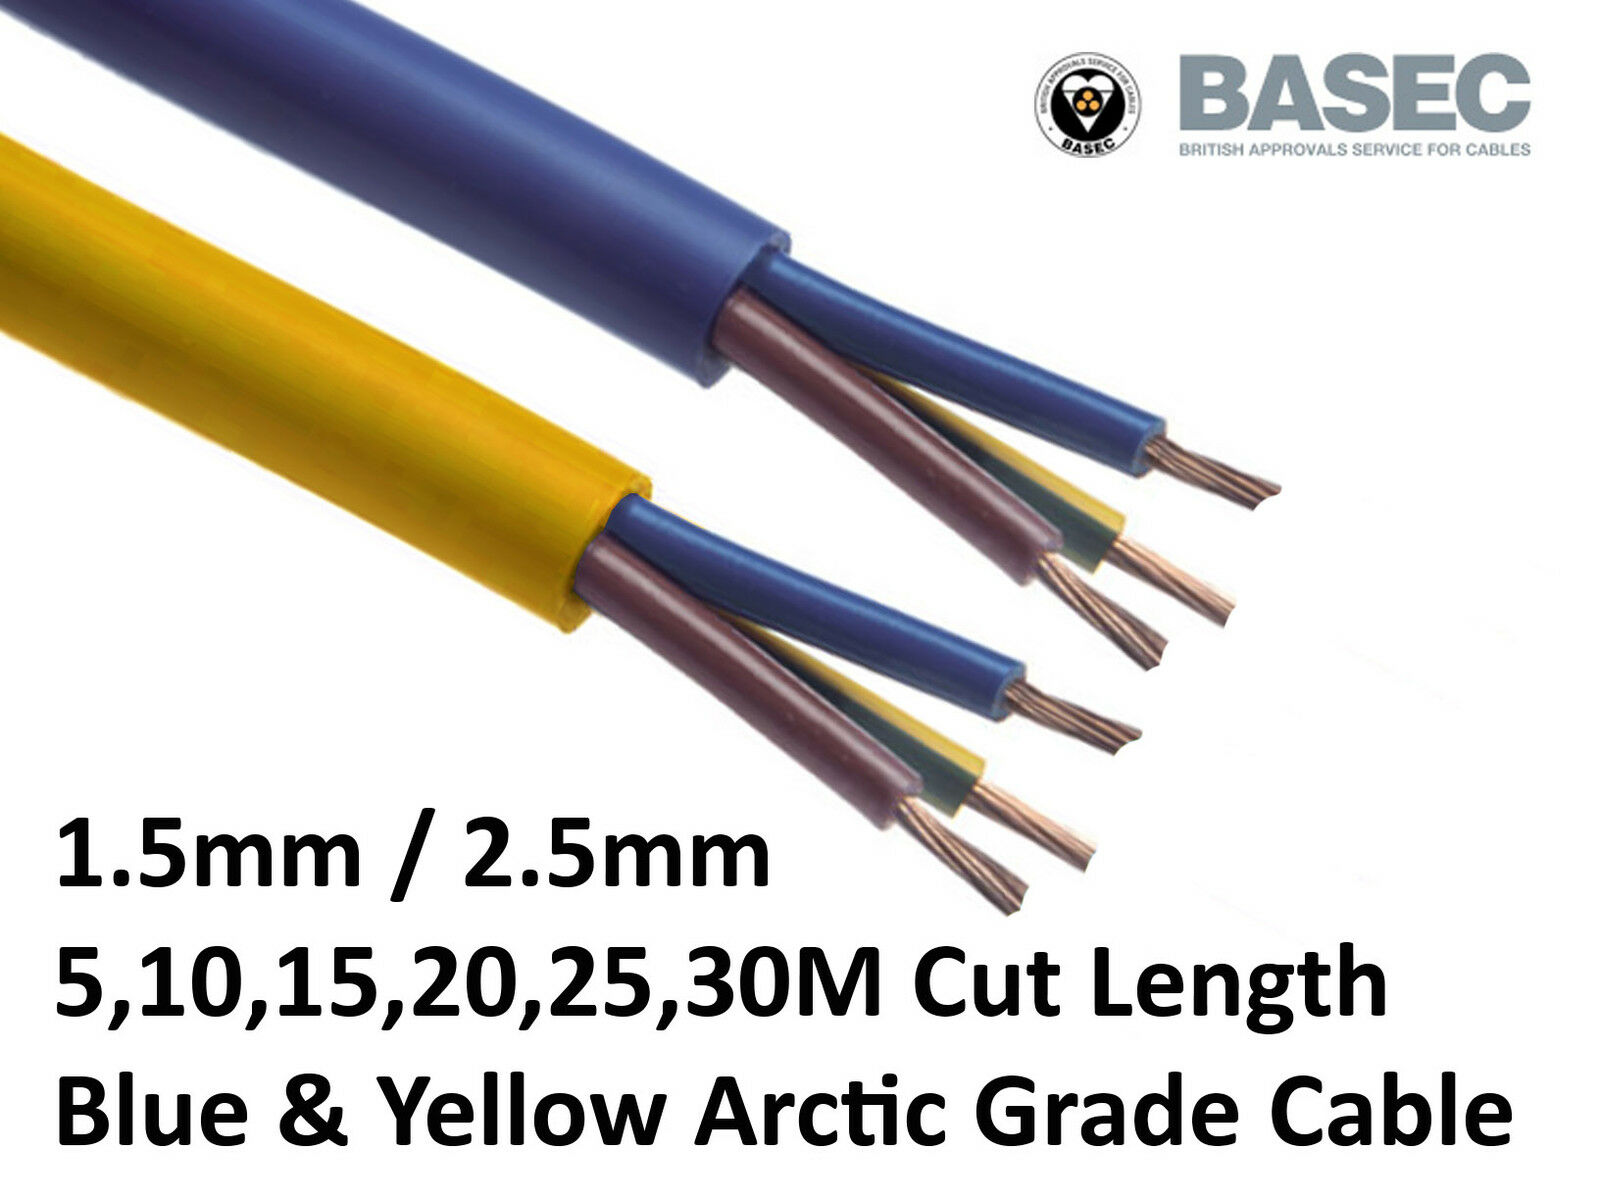 2.5mm Outdoor Caravan Camping Arctic Blue Yellow 3183 AG Flex Cable 3 core 1.5